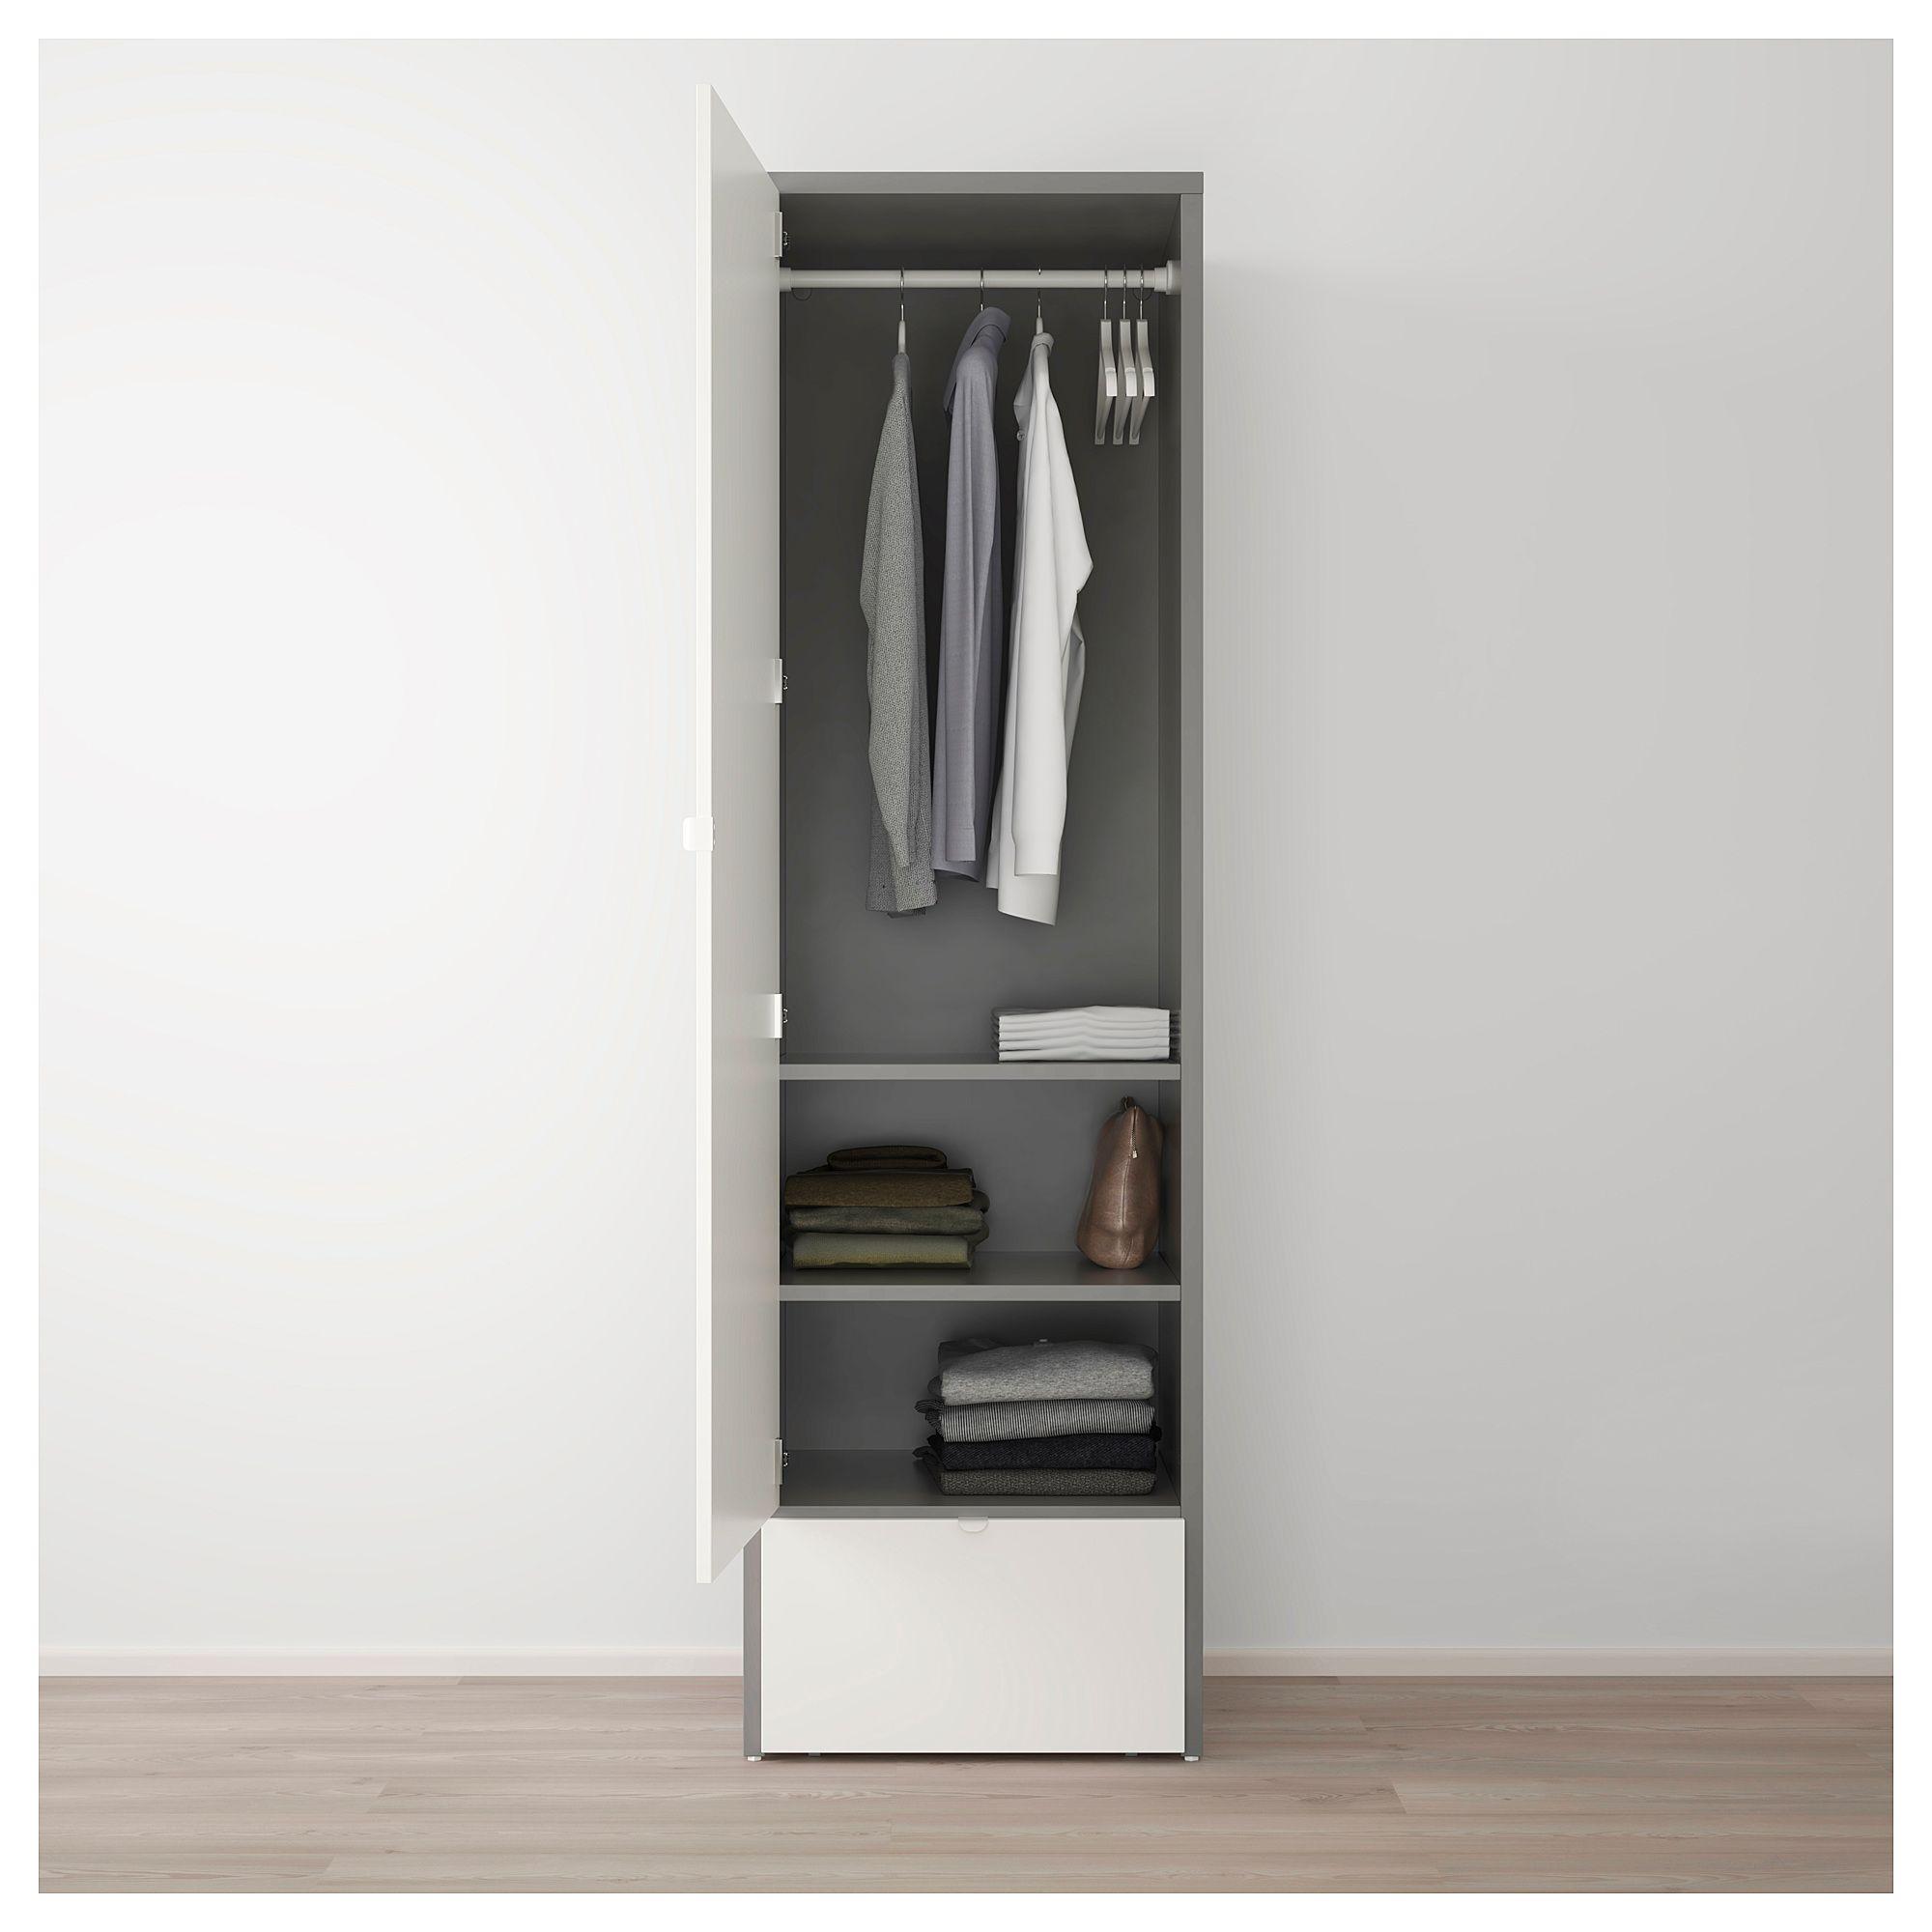 visthus wardrobe grey white ikea in 2019 susan house ikea rh pinterest com